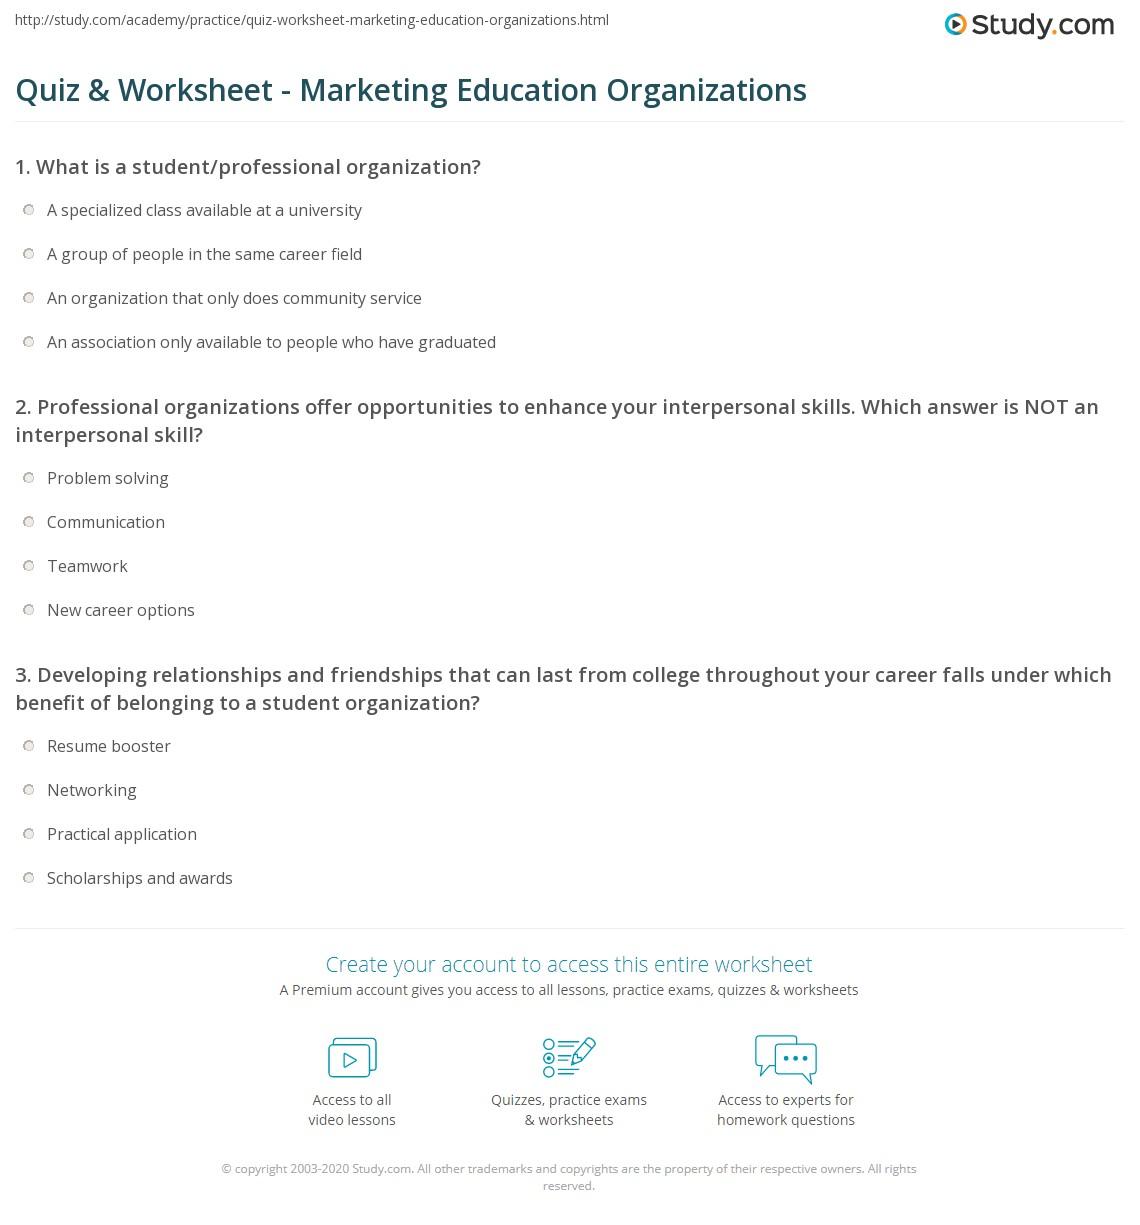 quiz worksheet marketing education organizations com print student professional organizations in marketing education worksheet